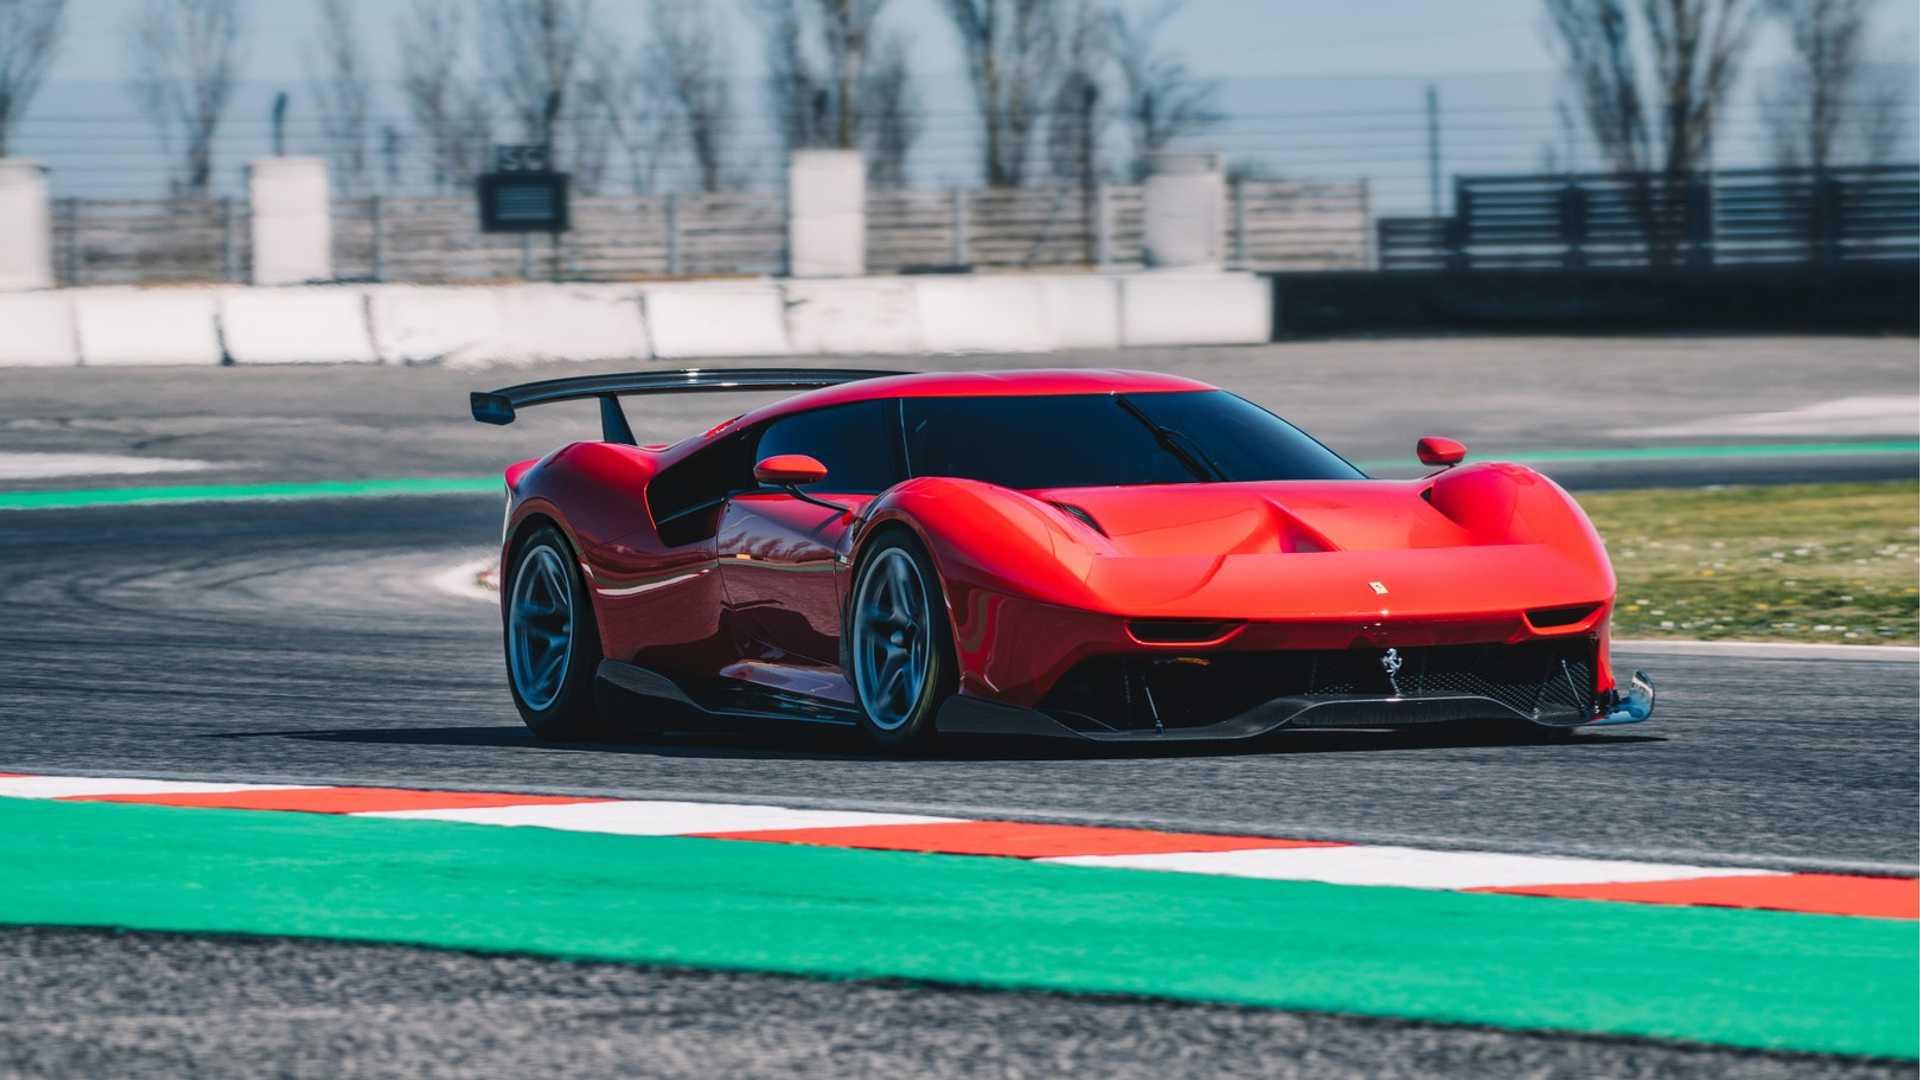 2019 Ferrari P80/C Front Wallpapers (2)